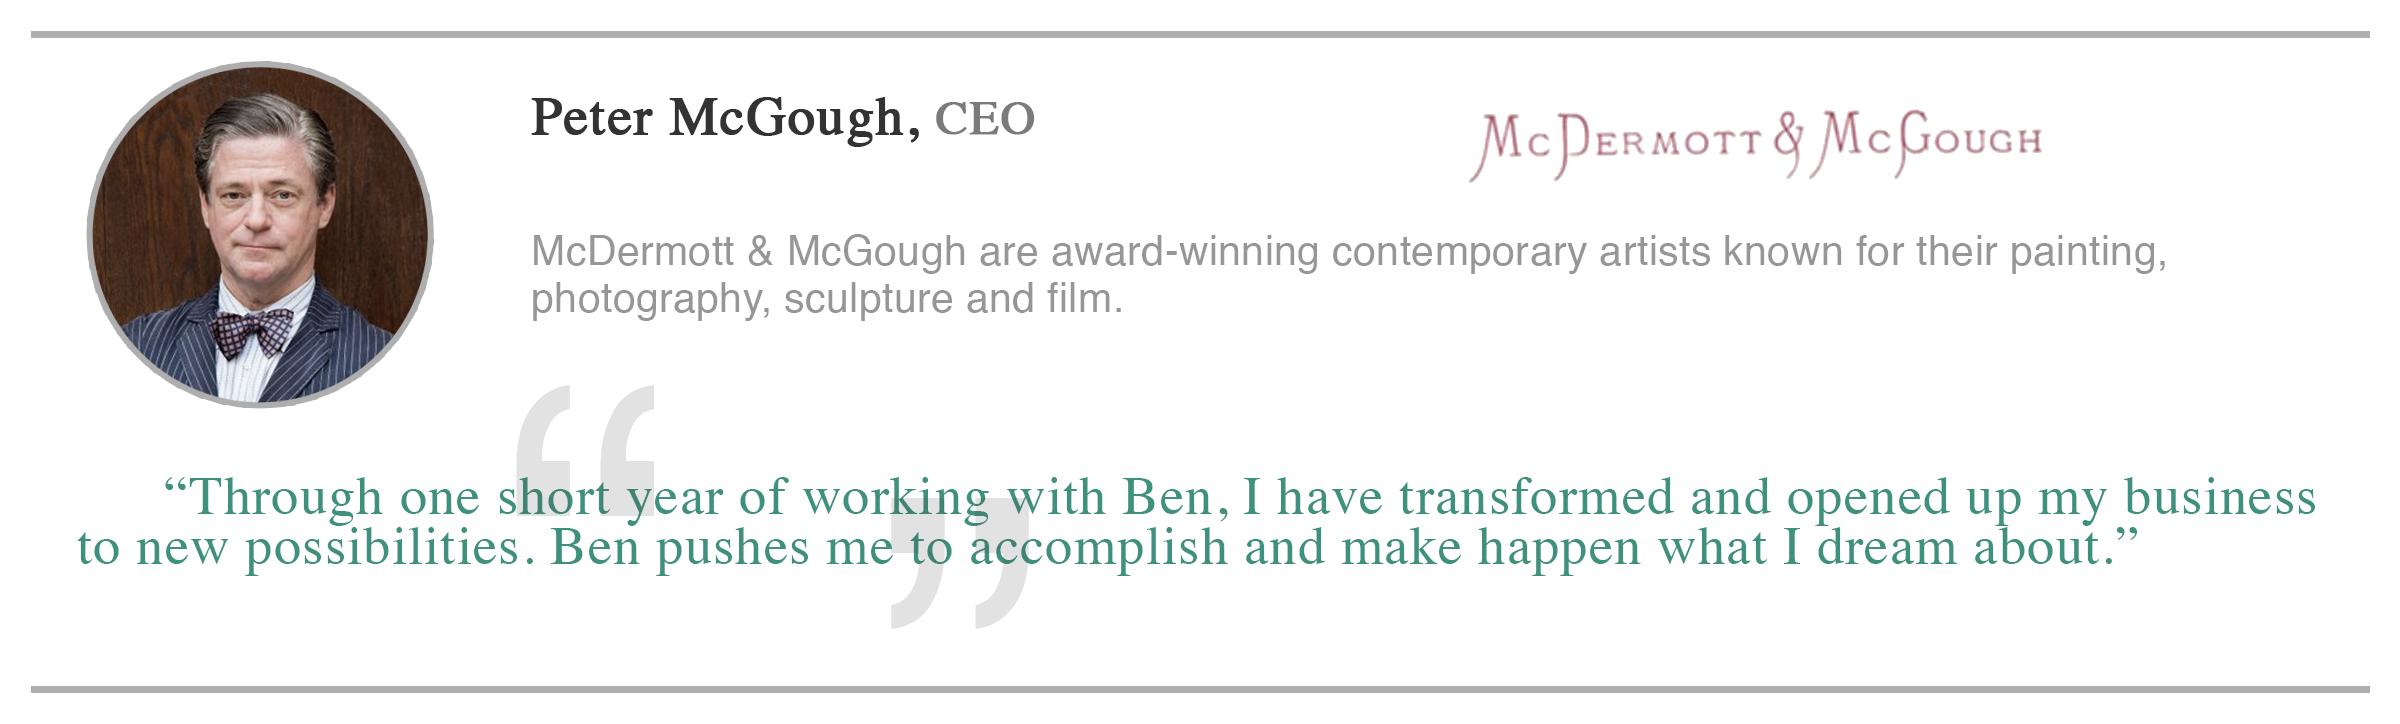 Peter_McGough_Testimonial.jpg